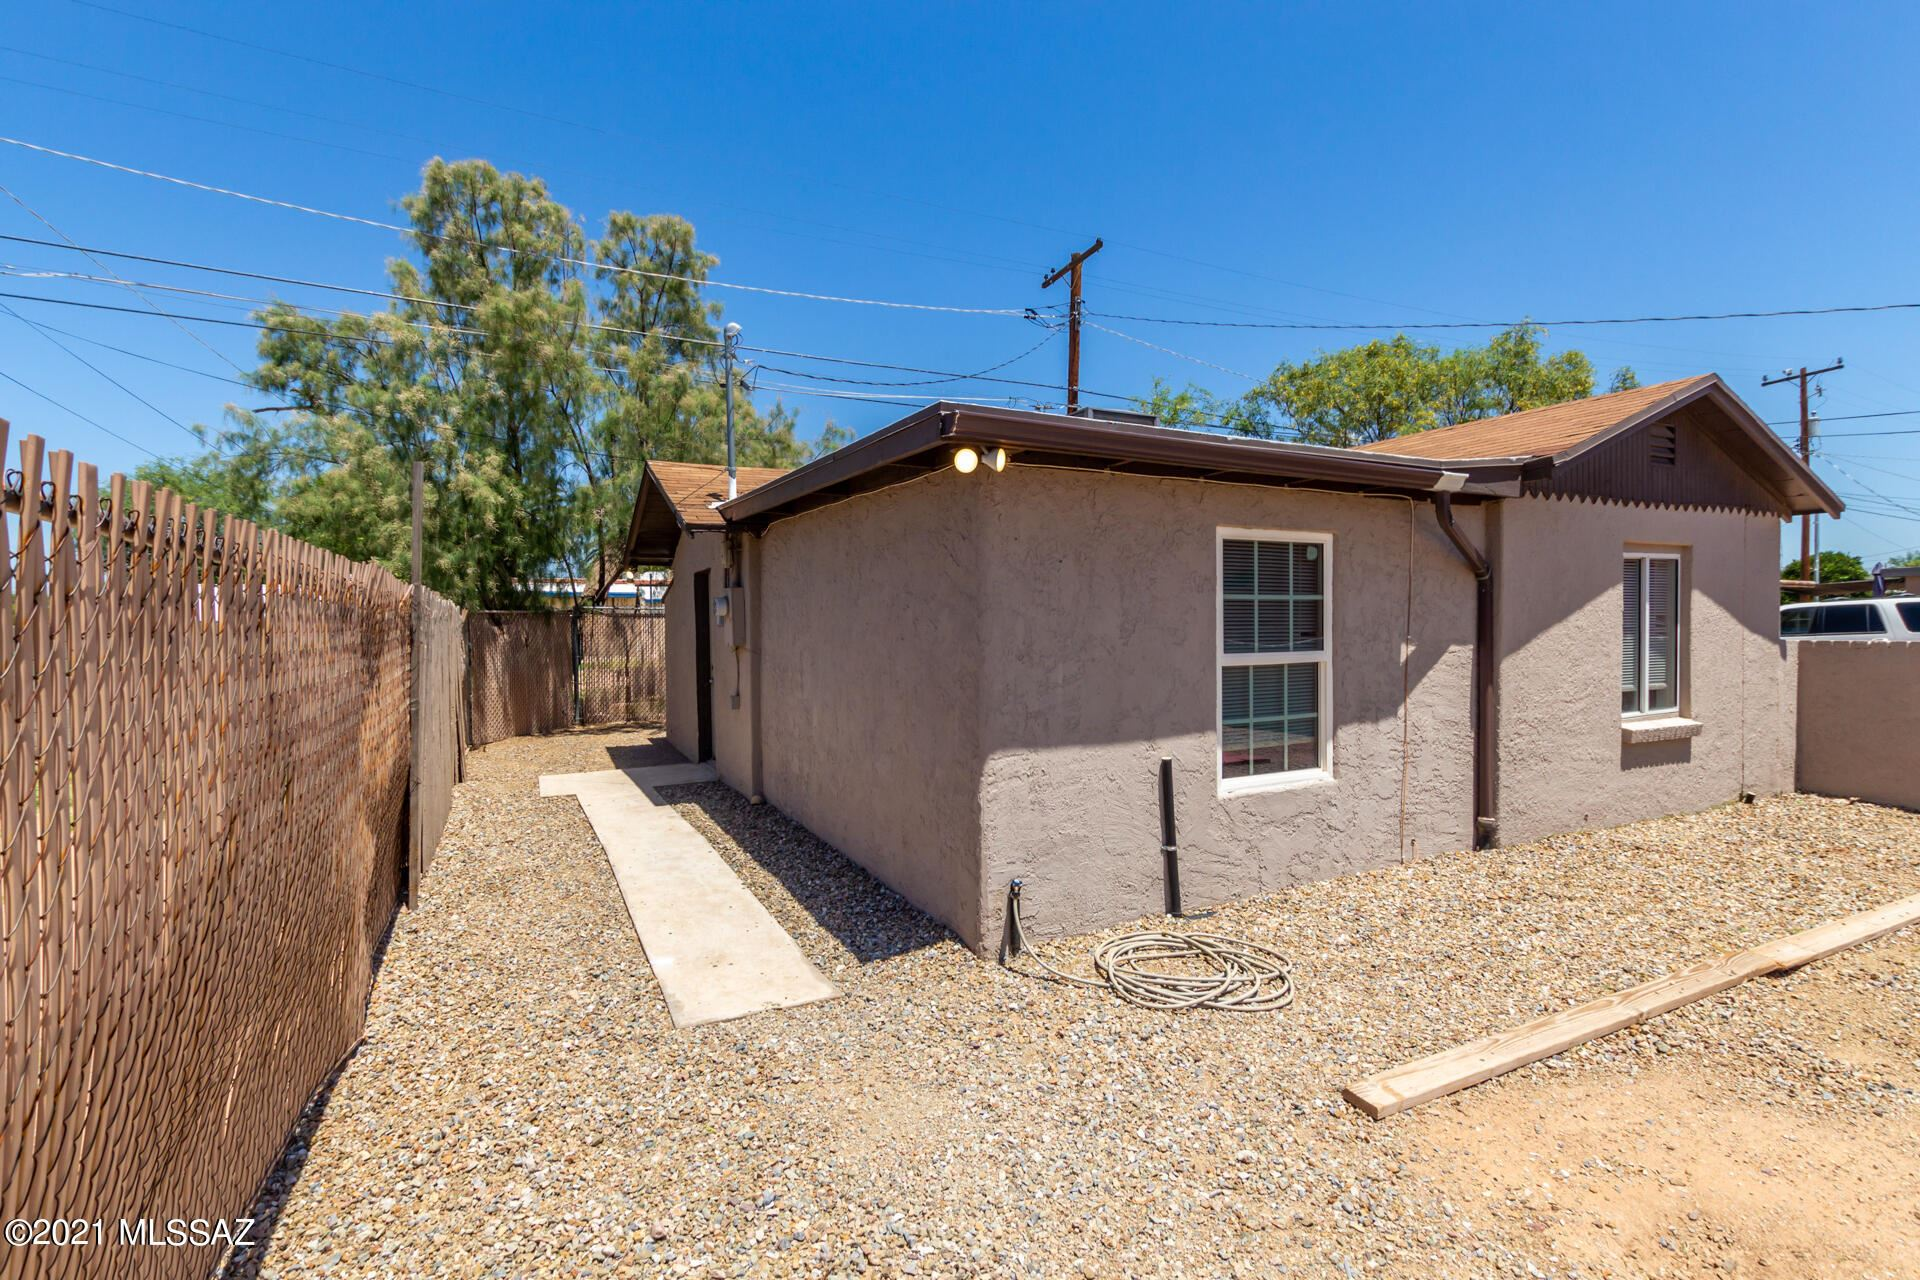 212 W Columbia Street, Tucson, AZ 85714 - MLS#: 22119968